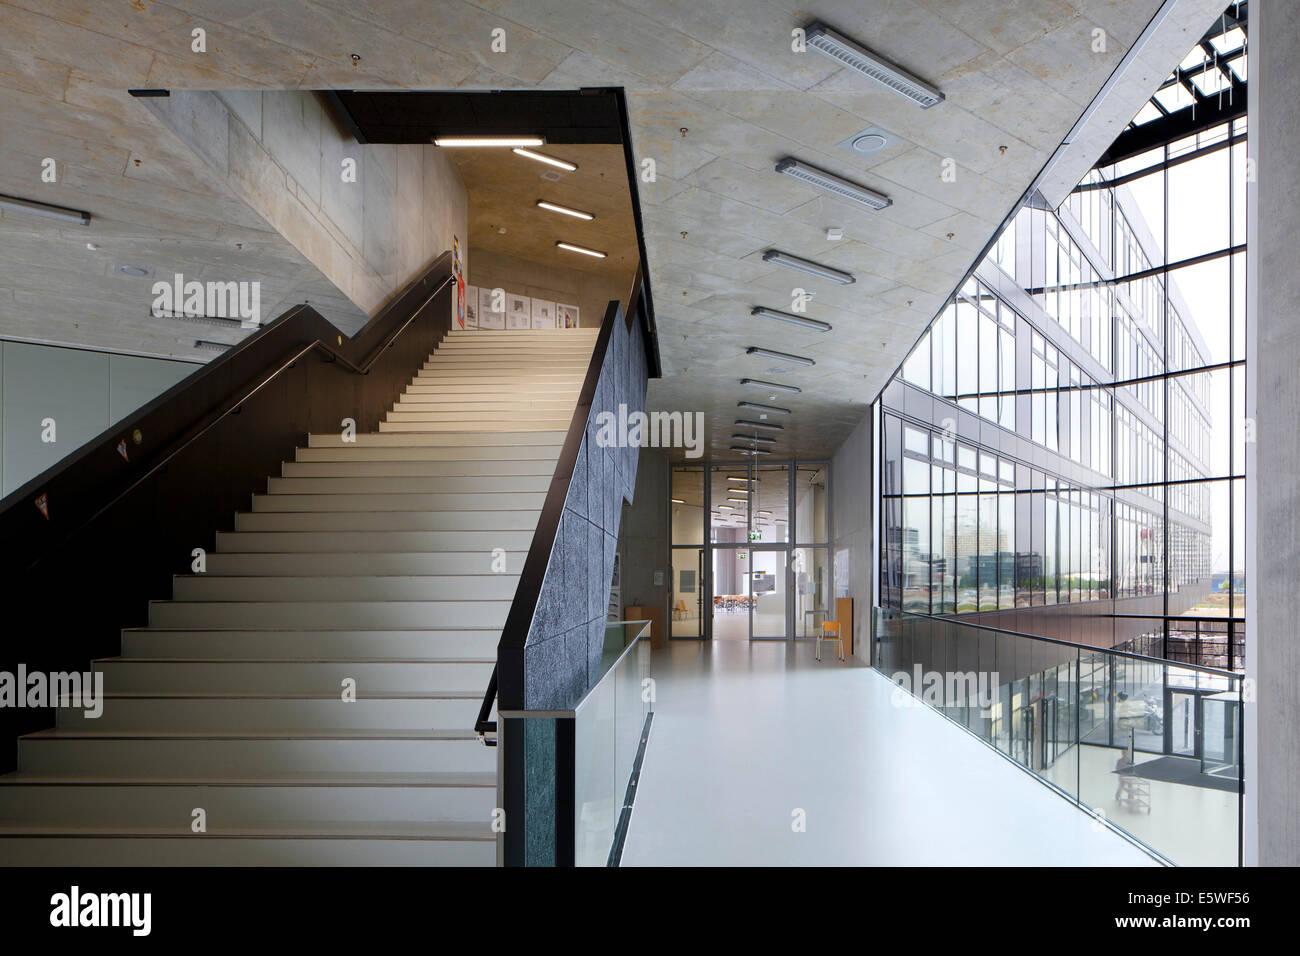 Staircase, HafenCity Universität Hamburg university, Hamburg, Germany - Stock Image